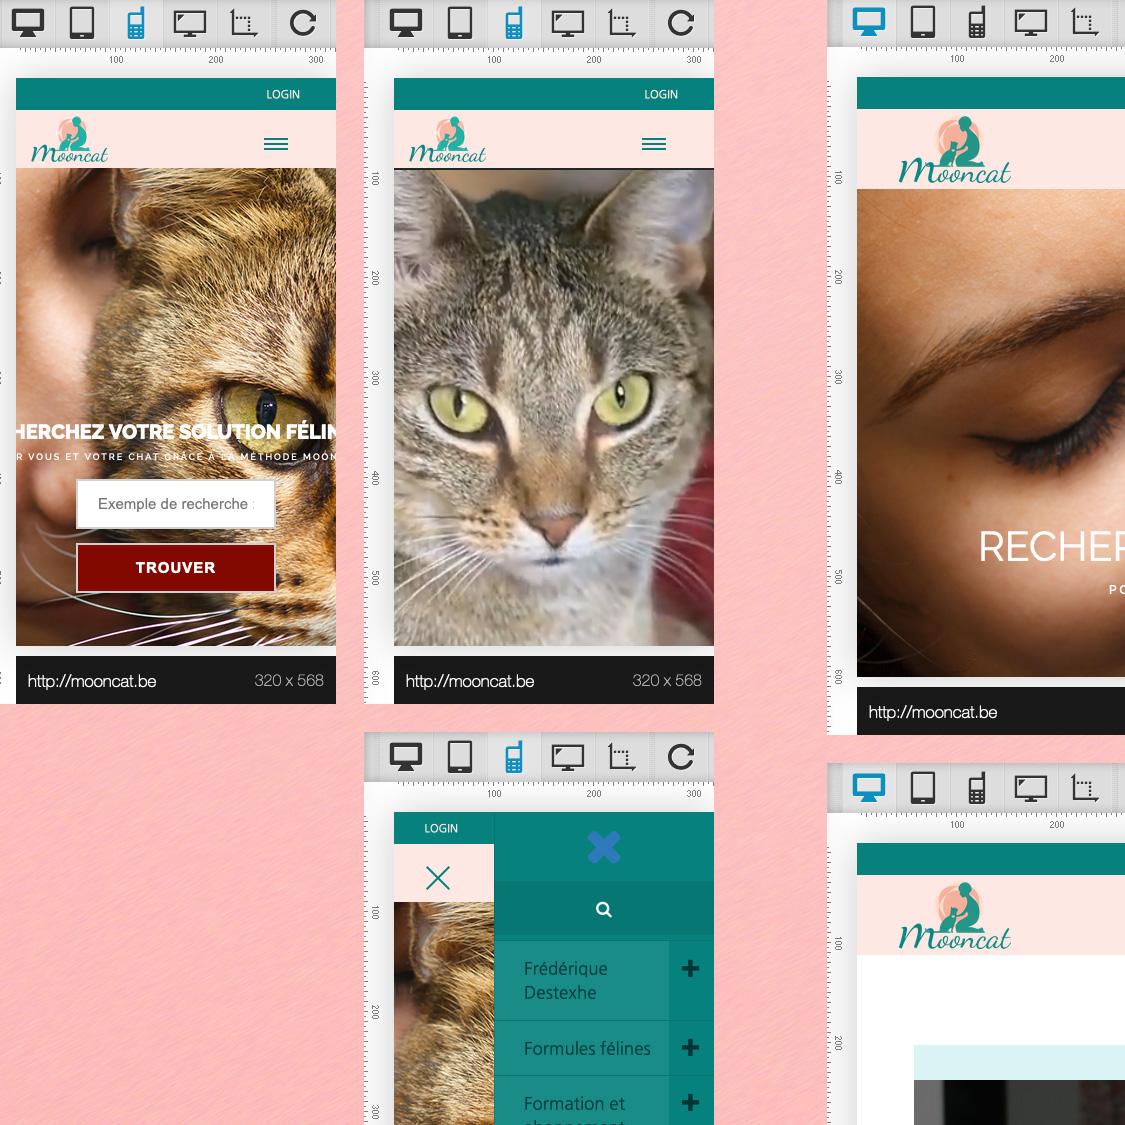 Mobil-first and multi device - Web design, web development, Digital marketing